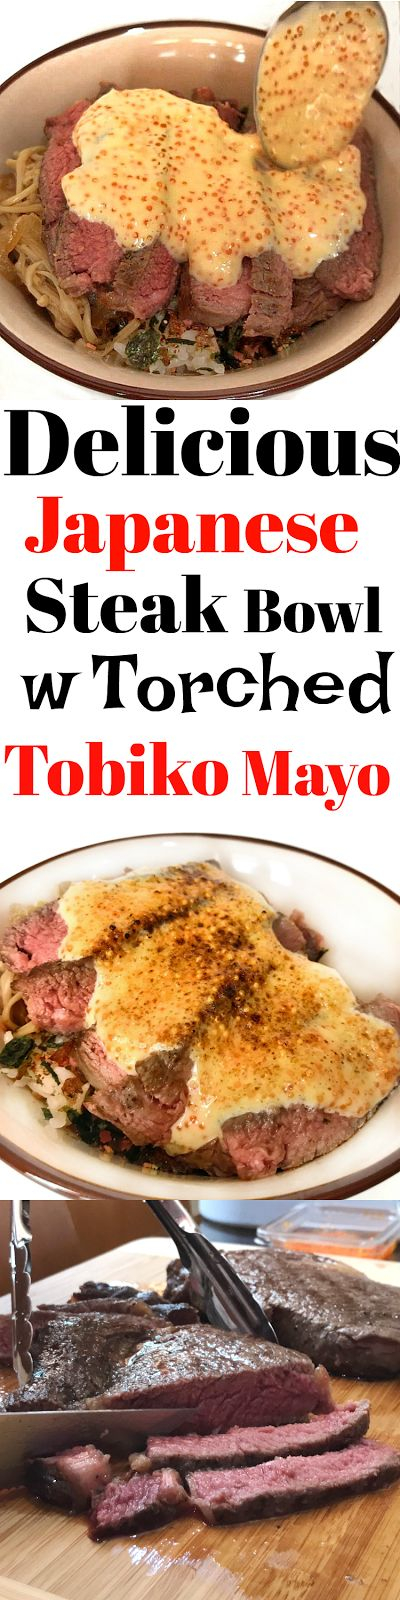 Flavourful Japanese Rice Bowl with Medium Rare Sous Vide Steak, Enoki Mushrooms, Seaweed Furikake and Torched Tobiko Mayo!! SO DELICIOUS